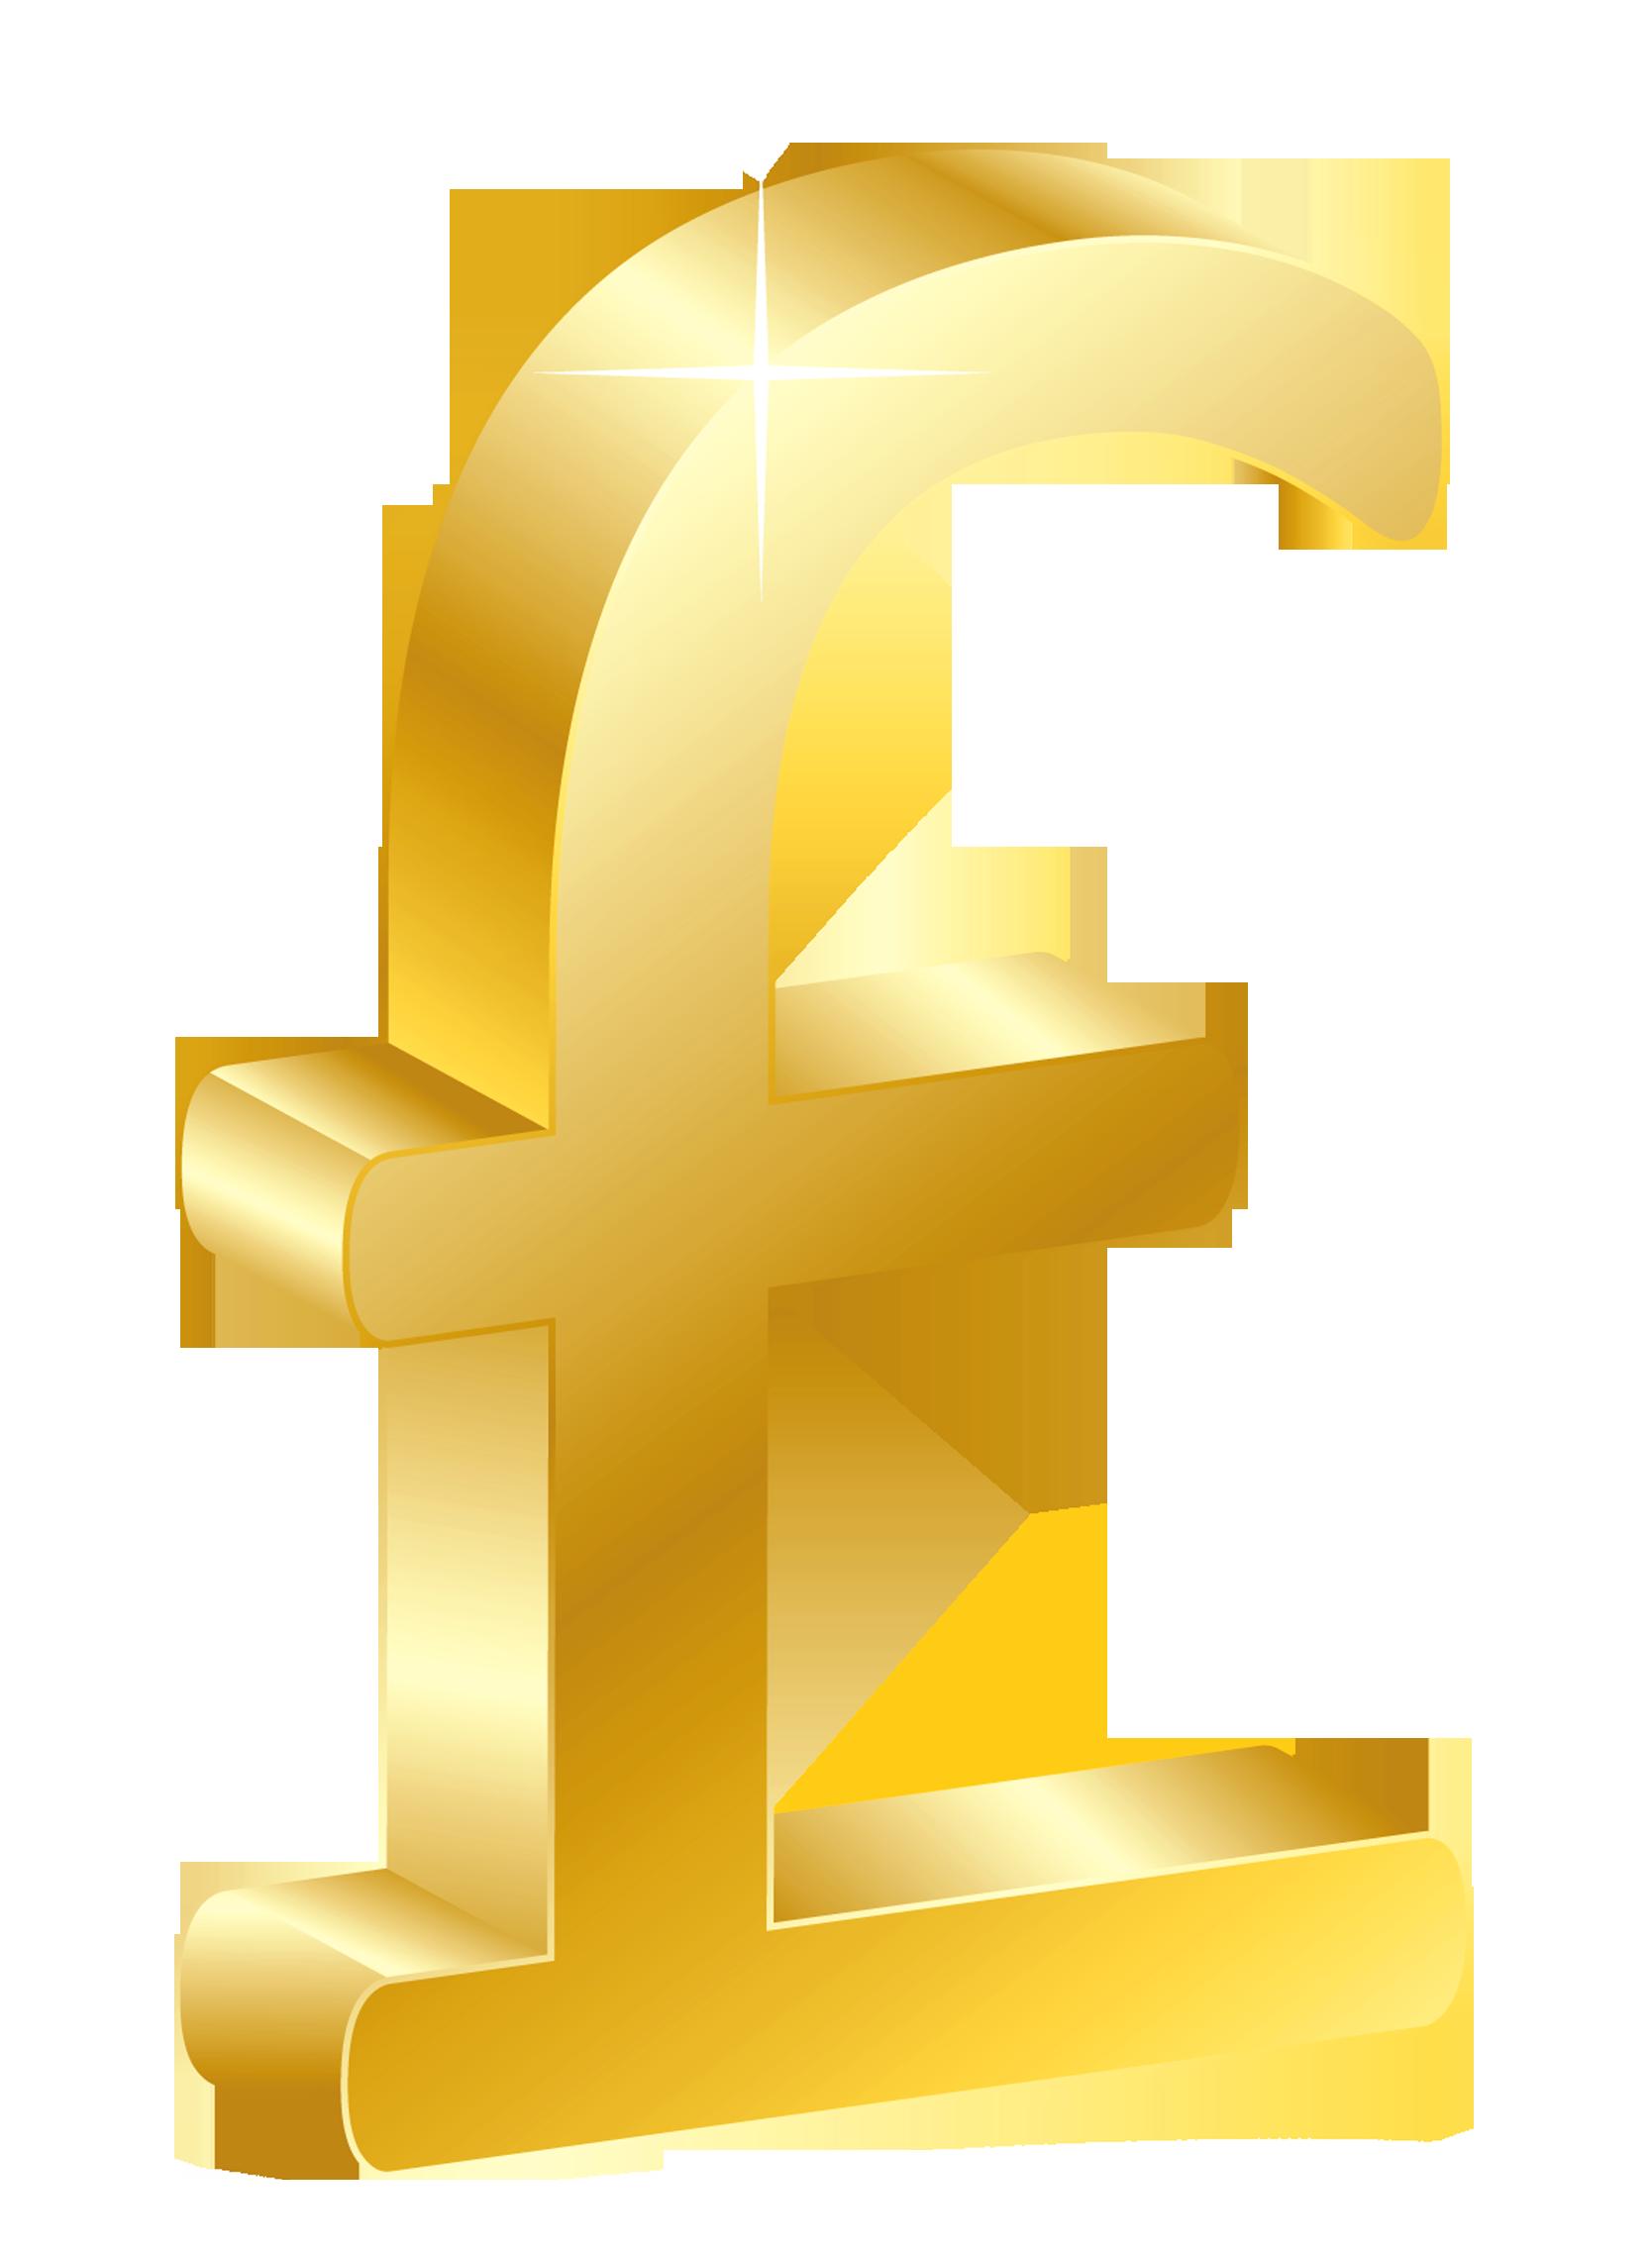 Money clip art png.  d gold uk